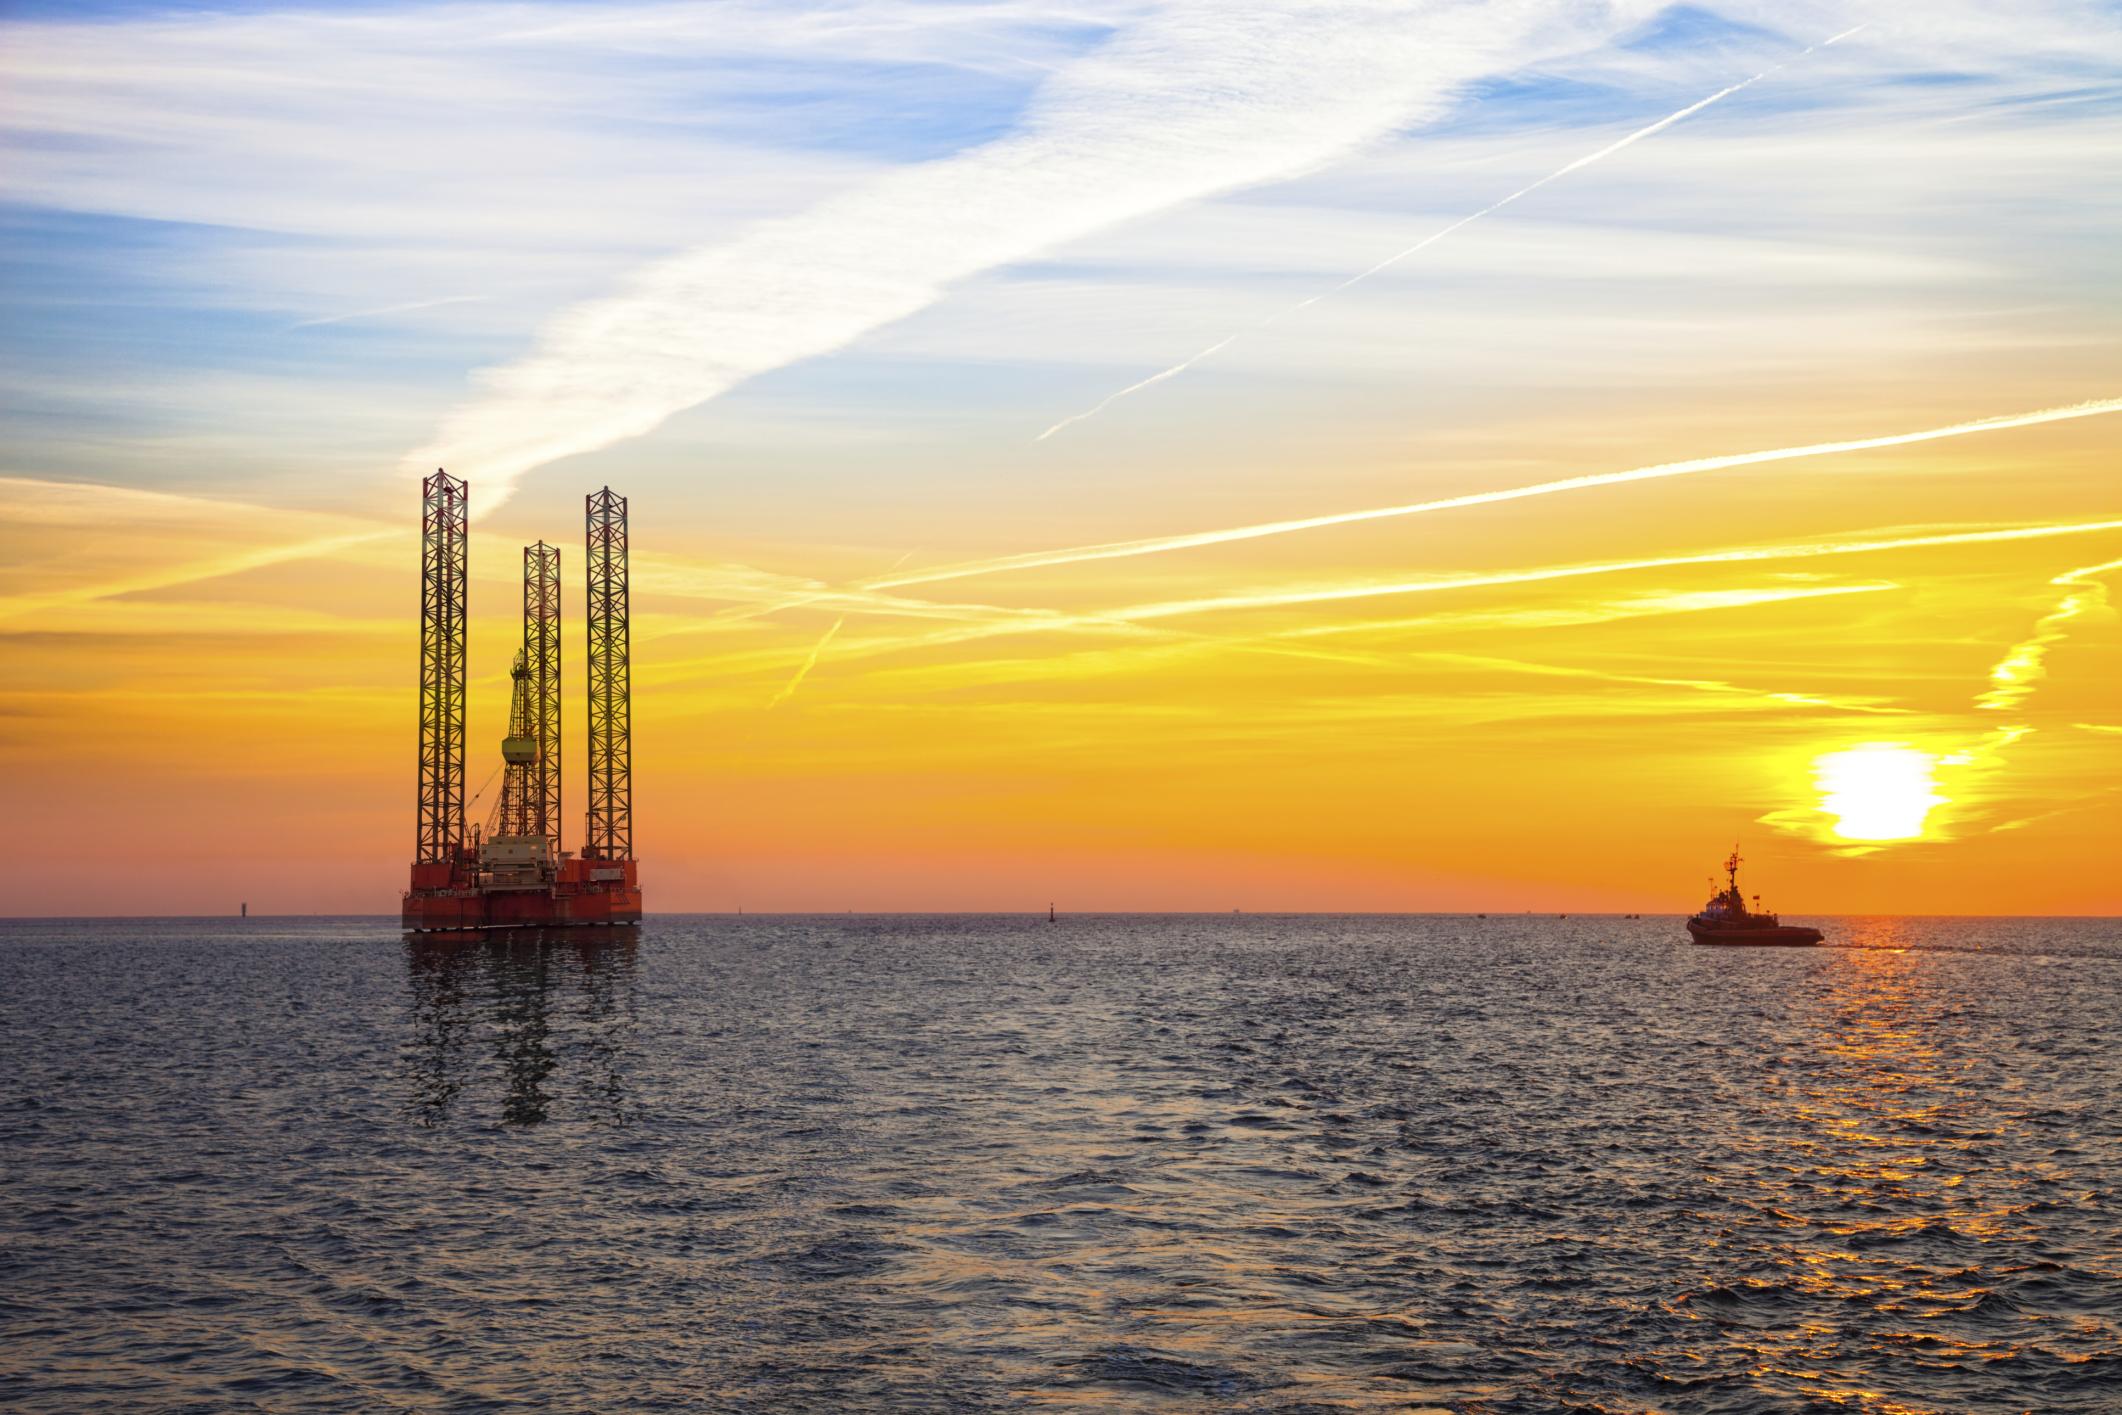 jackup rig on the horizon.